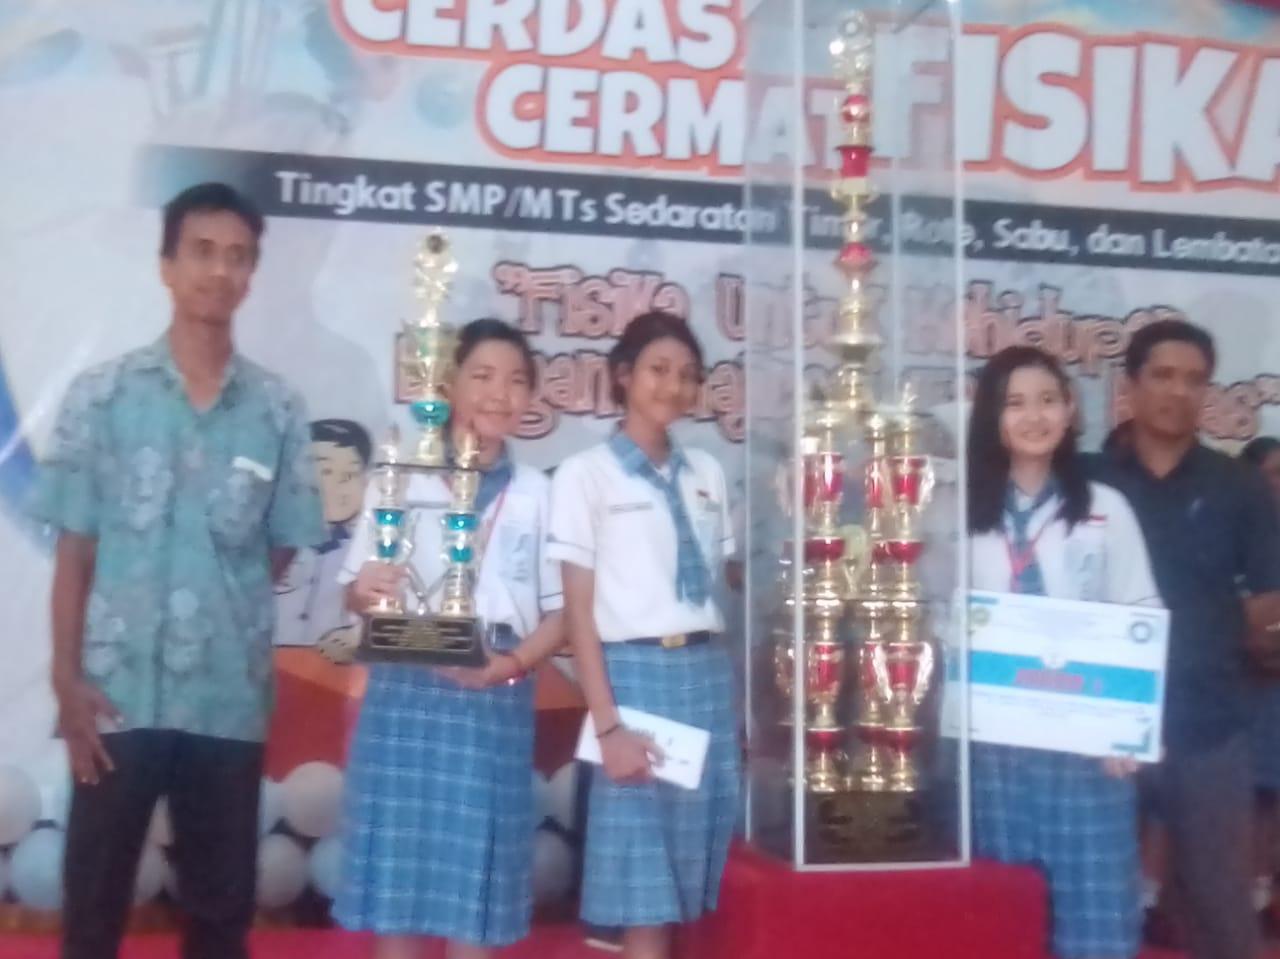 SMP Katolik St.Theresia Kupang Juara CCF tingkat SMP/M.Ts Sedaratan Timor, Rote, Sabu dan Lembata.